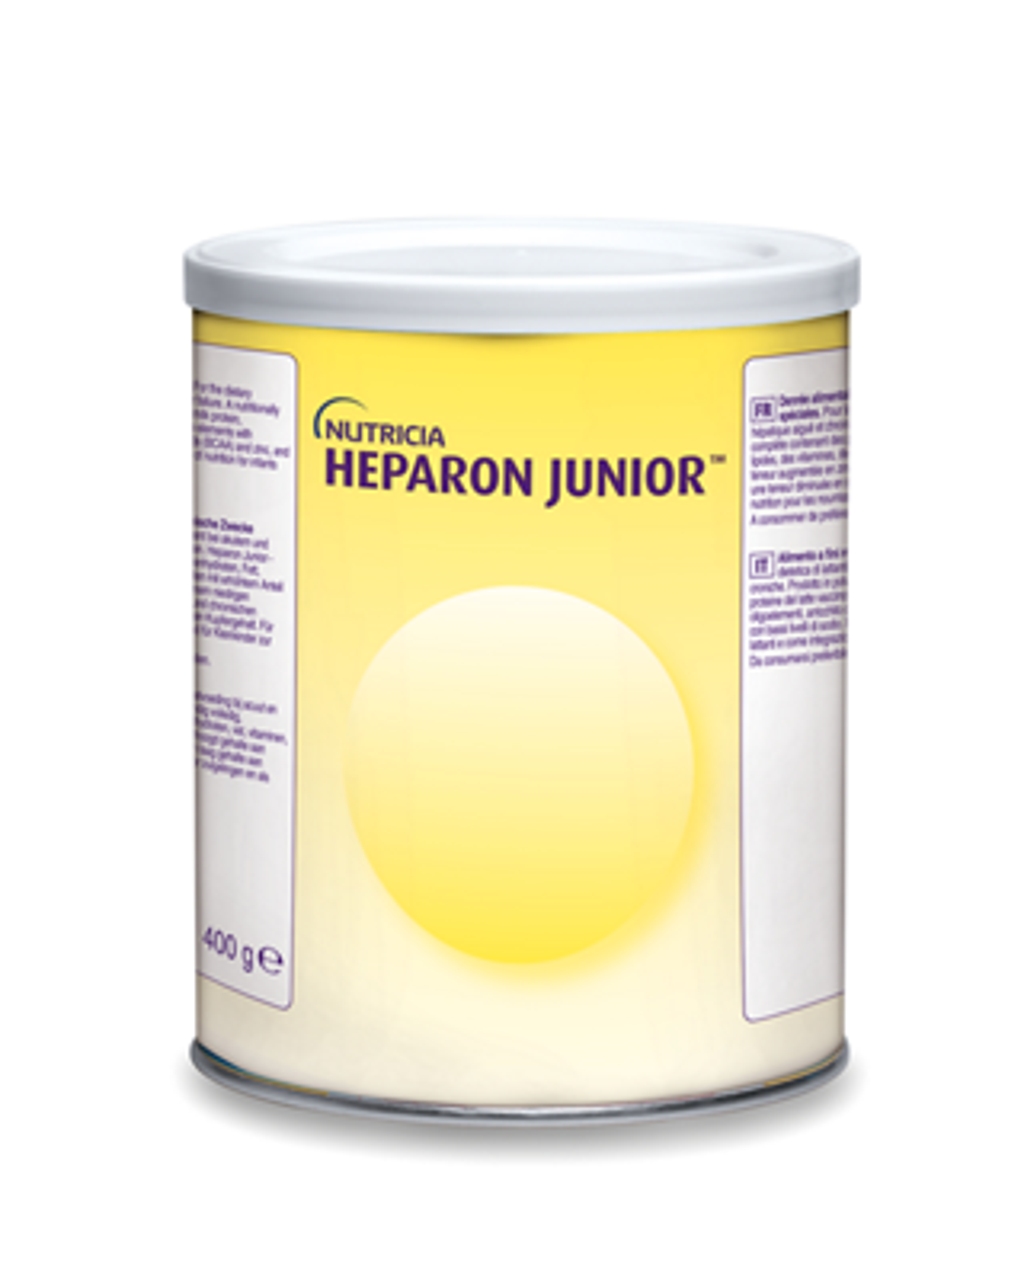 heparon-junior-400g-tin.png